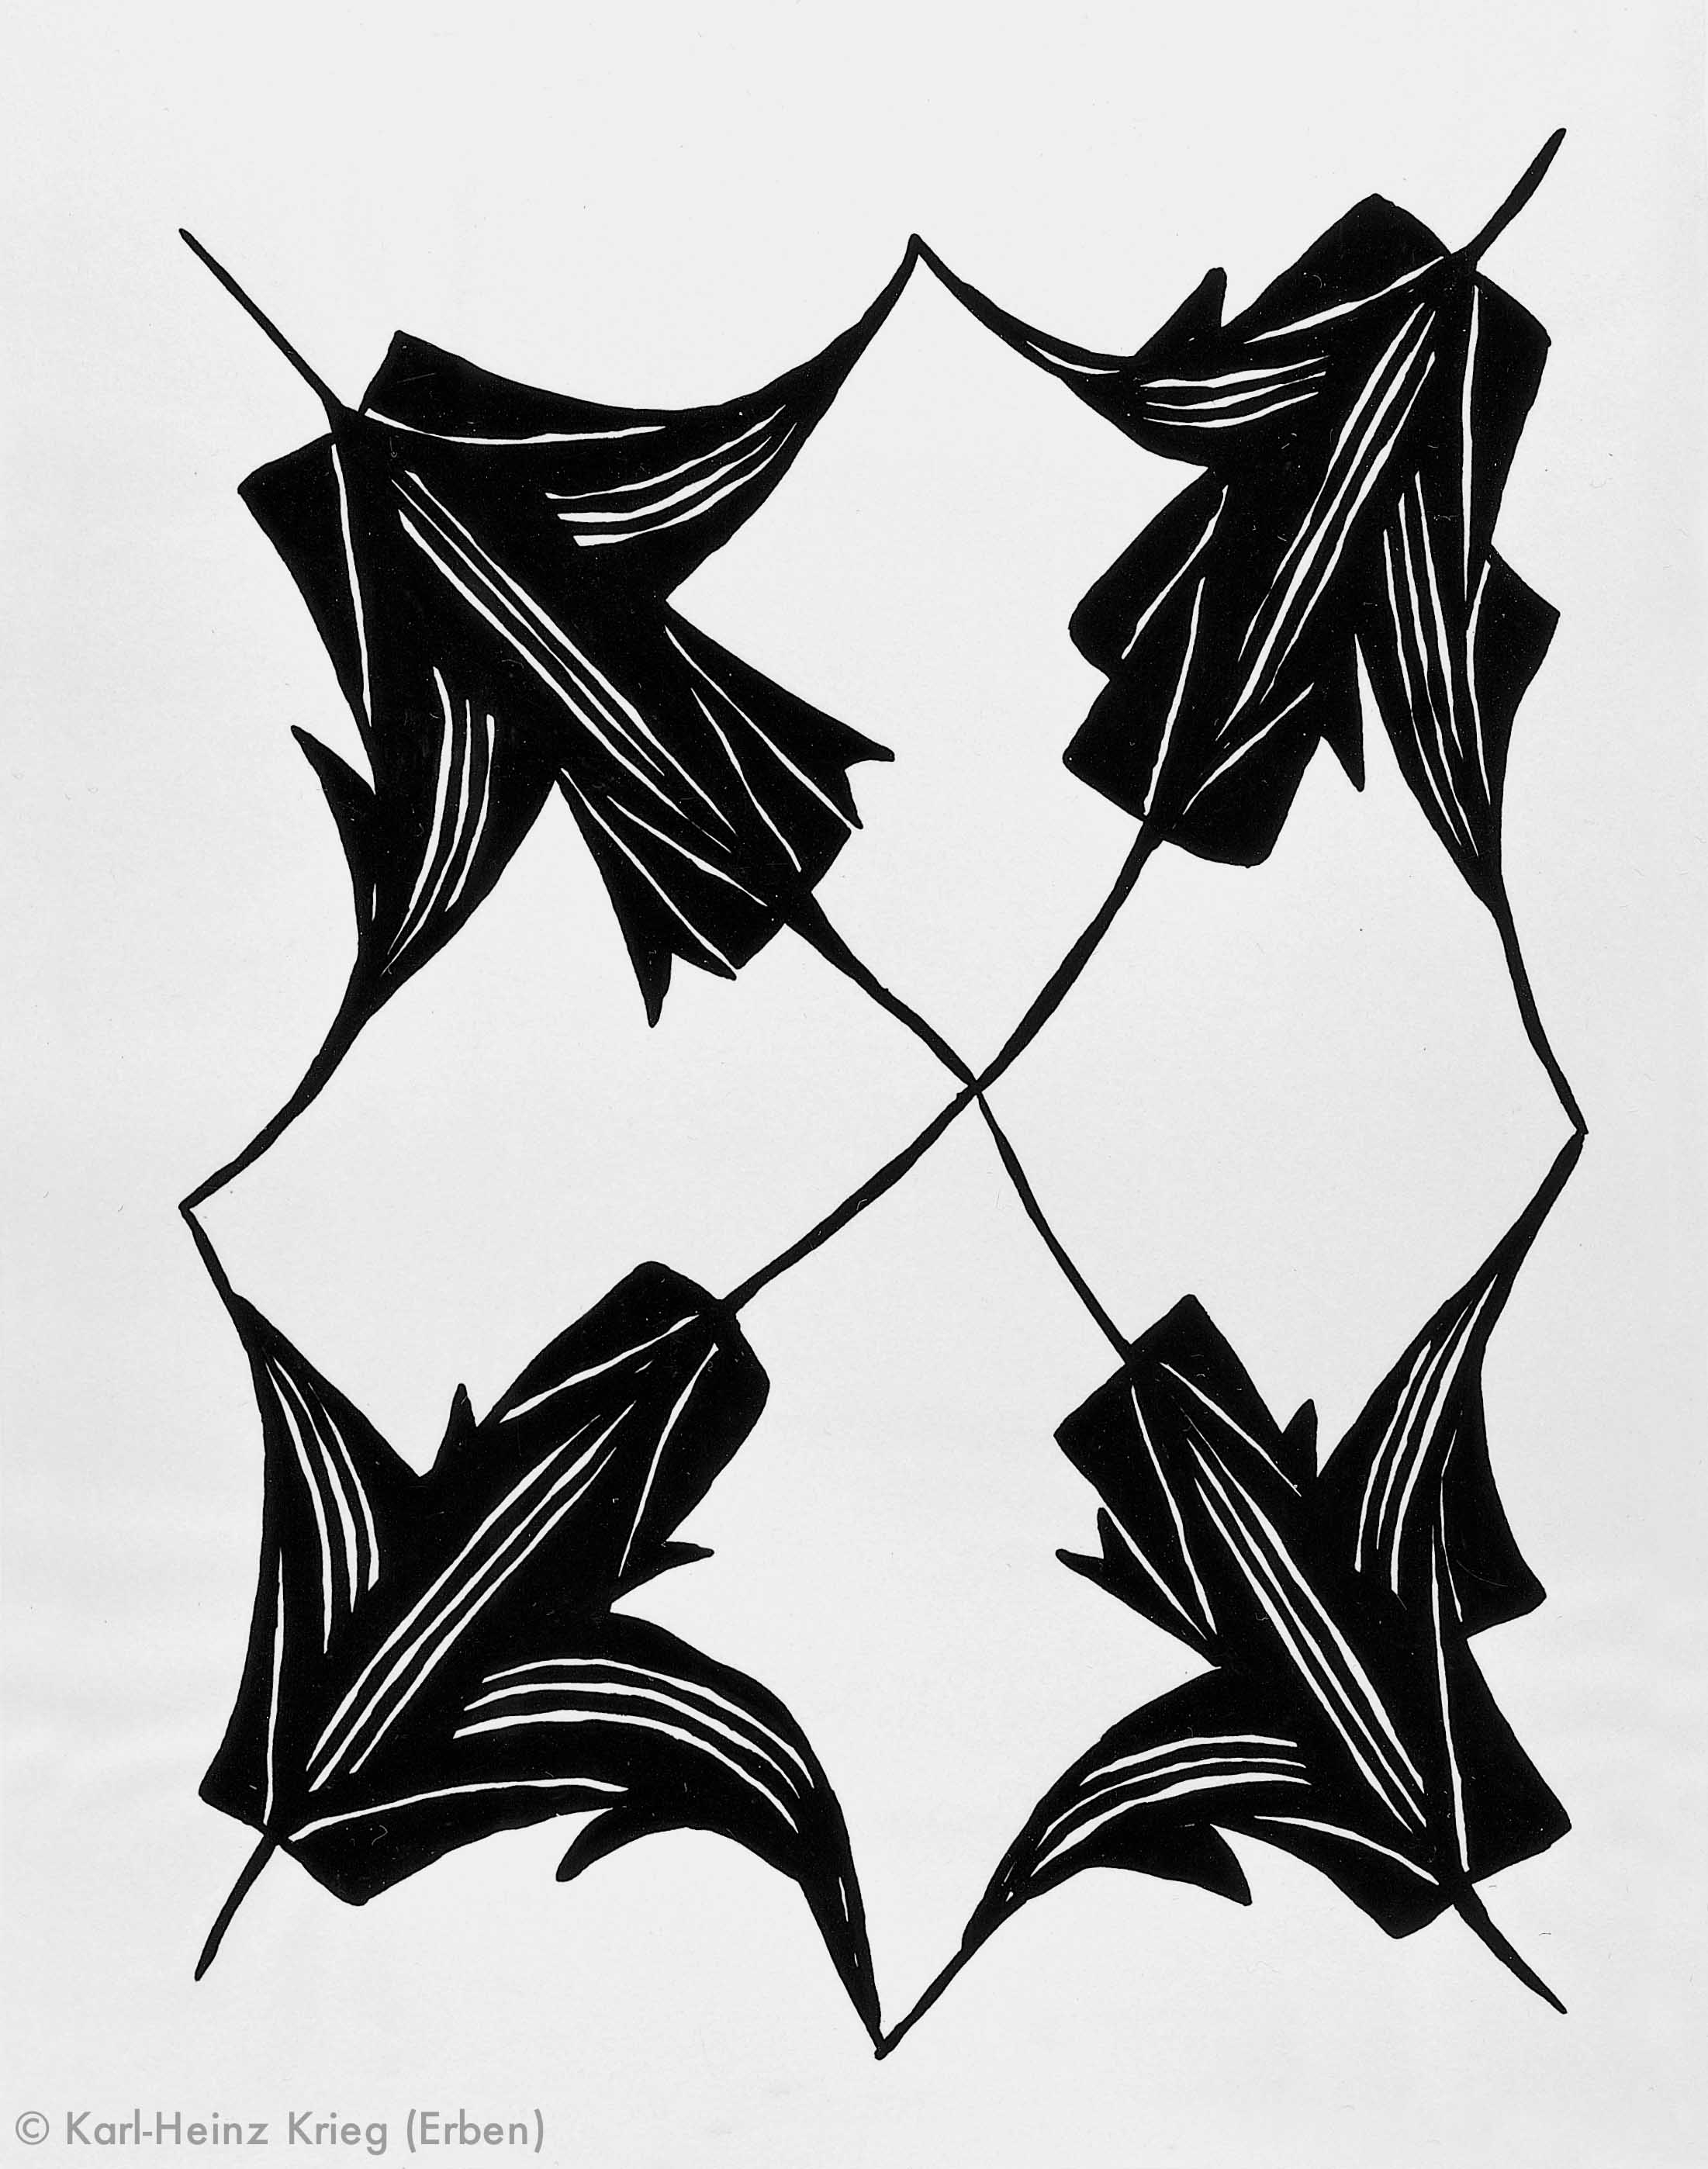 Pévé Zoumanigi Sévhézévhégoi, Stil: Zawagi, 1990 Dispersionsfarbe/Papier, grundiert 64,5 x 50 cm Werknr. 39-1990/49